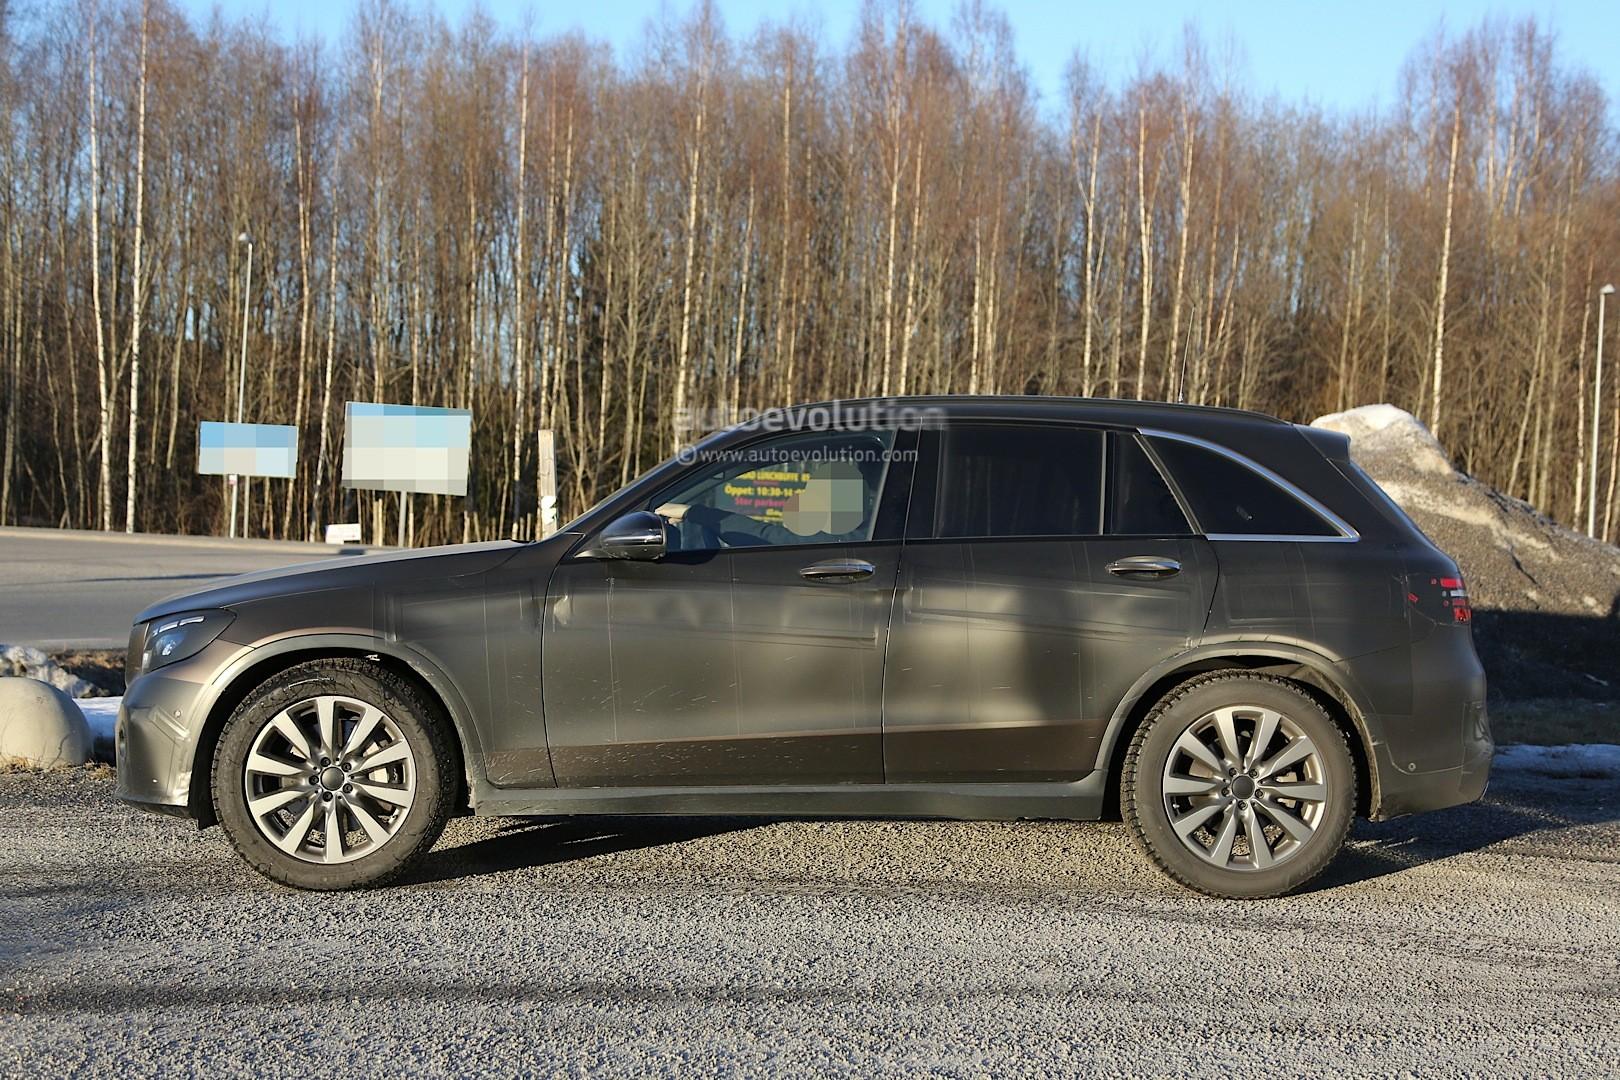 2015 - [Mercedes] GLC (GLK II) [X205] - Page 10 2016-mercedes-glc-spy-photos-show-nearly-undisguised-pre-production-prototypes_15